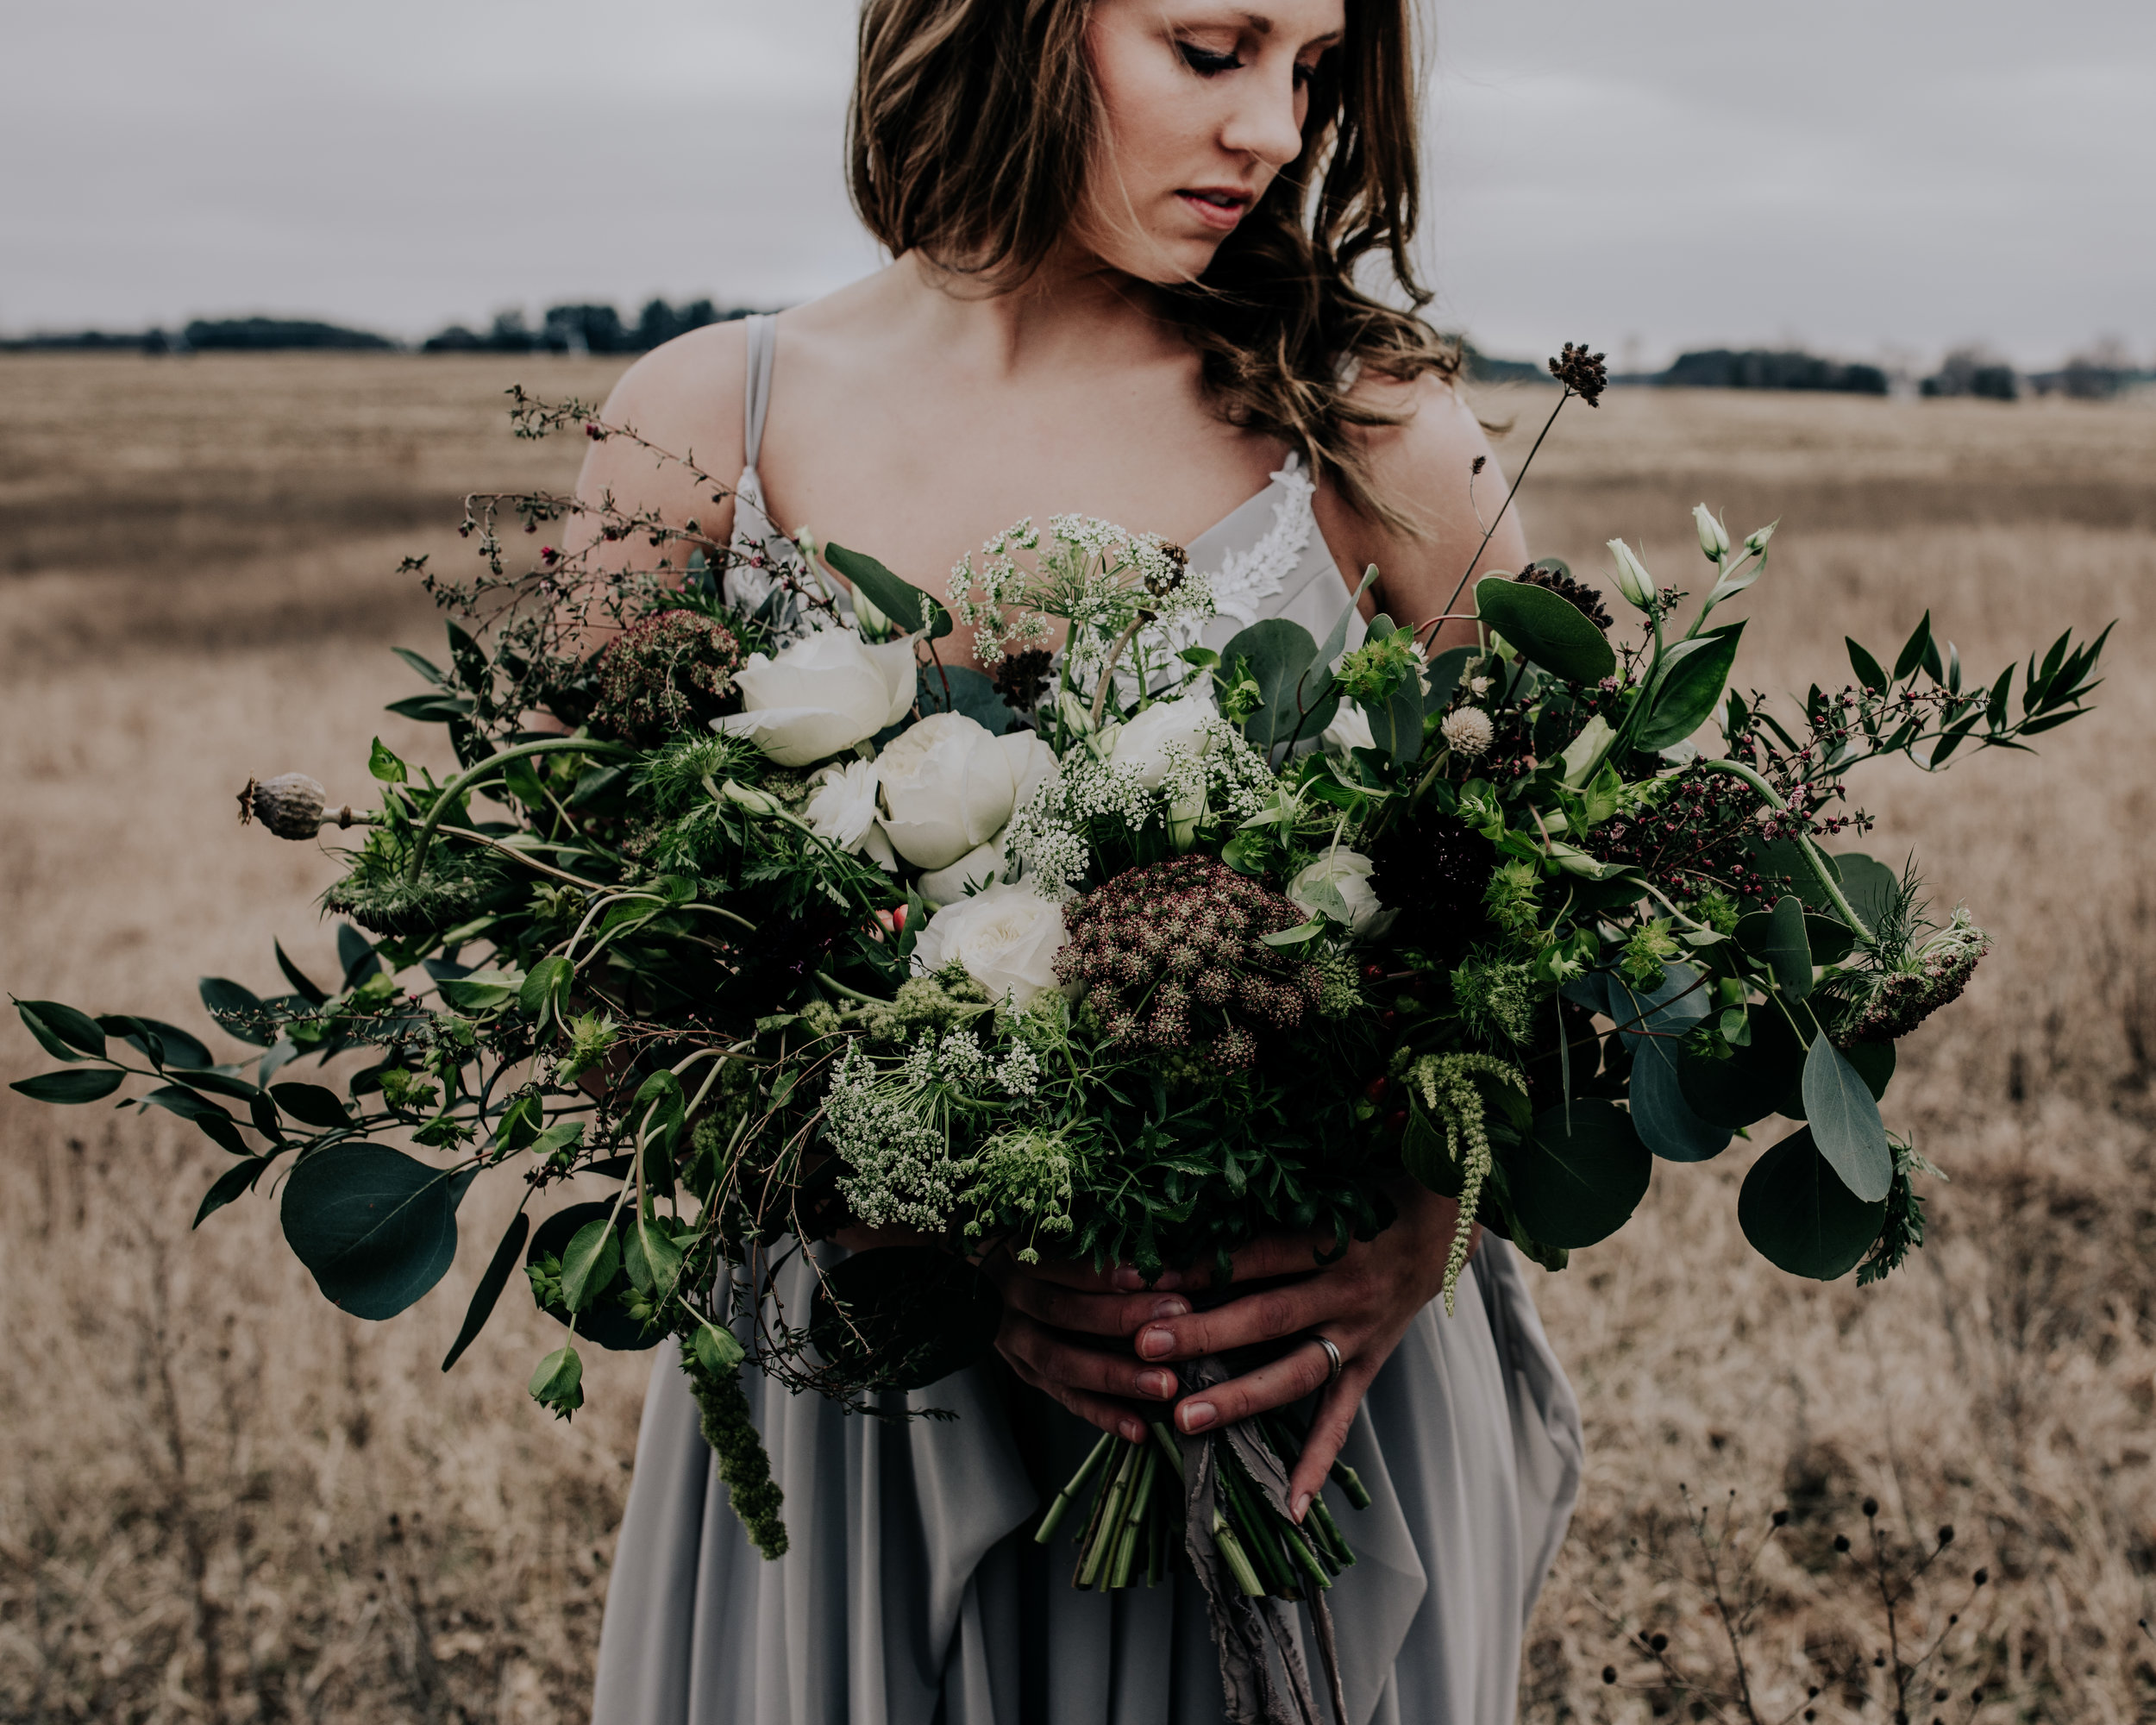 Midwestern Bride Styling - Monica Rose Freng Custom Designed Wedding Gowns - Jennifer Joyce Designs Florals